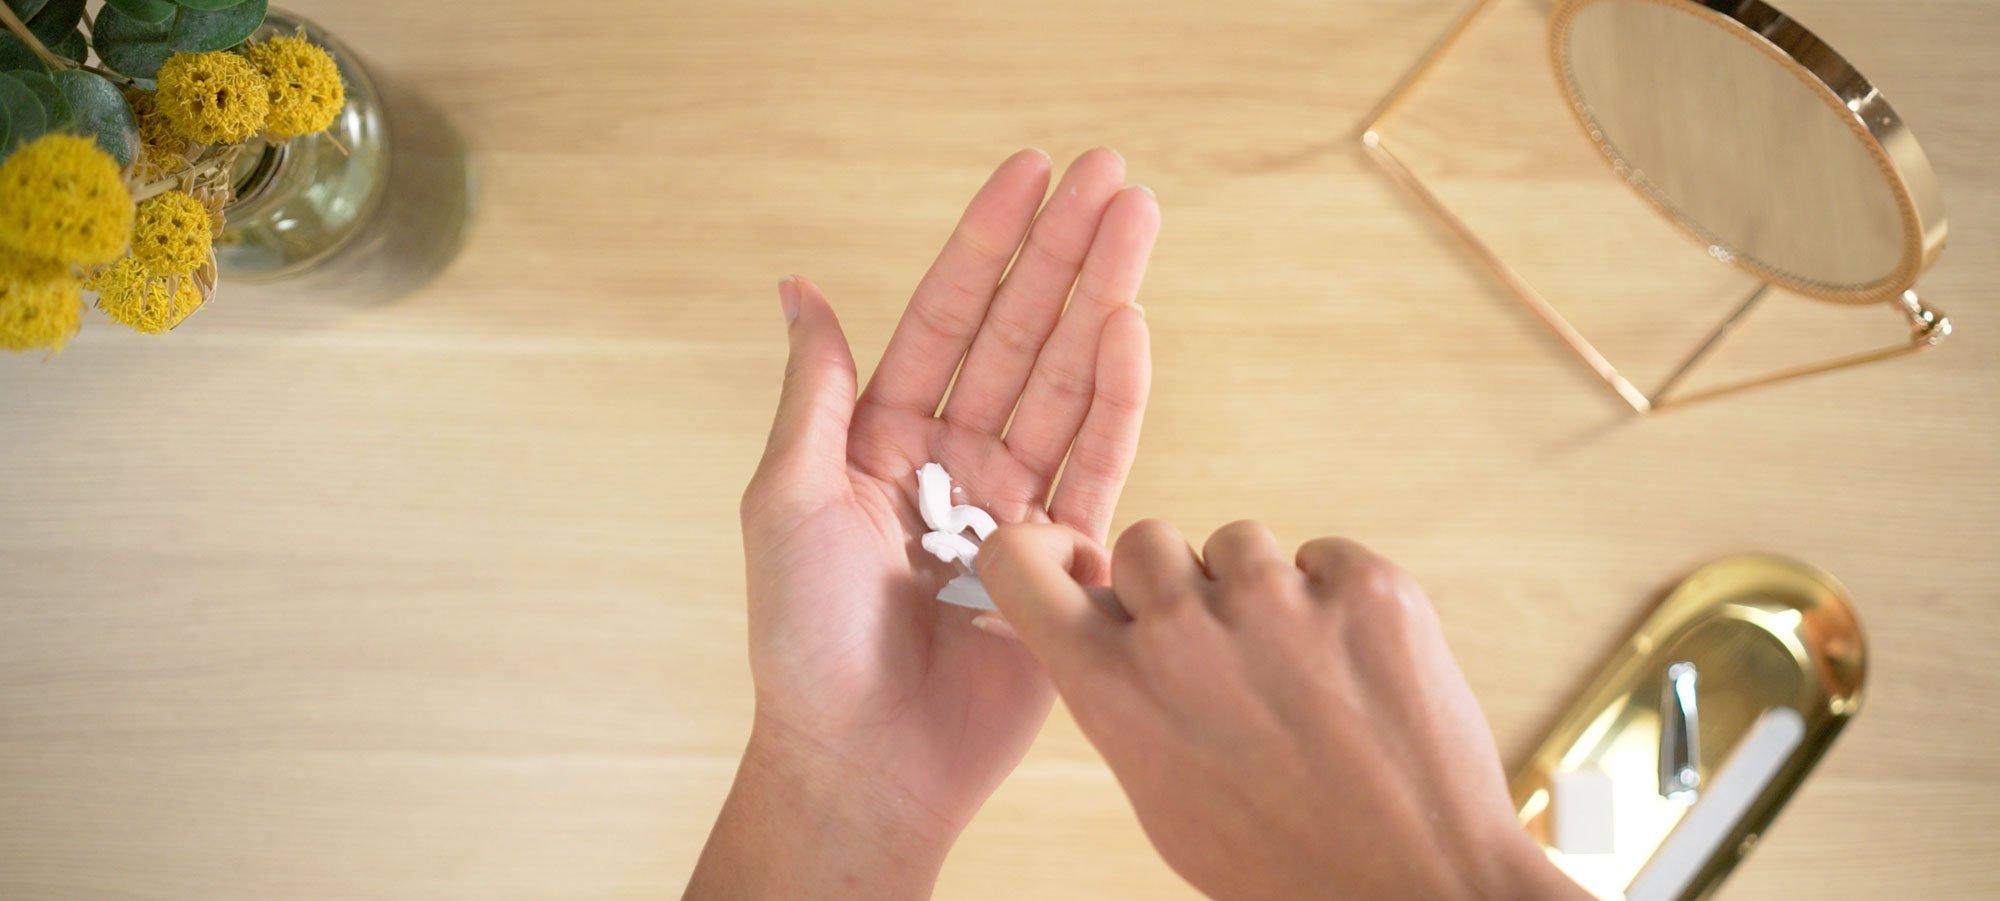 Vitamin Recharge Mani in a Box